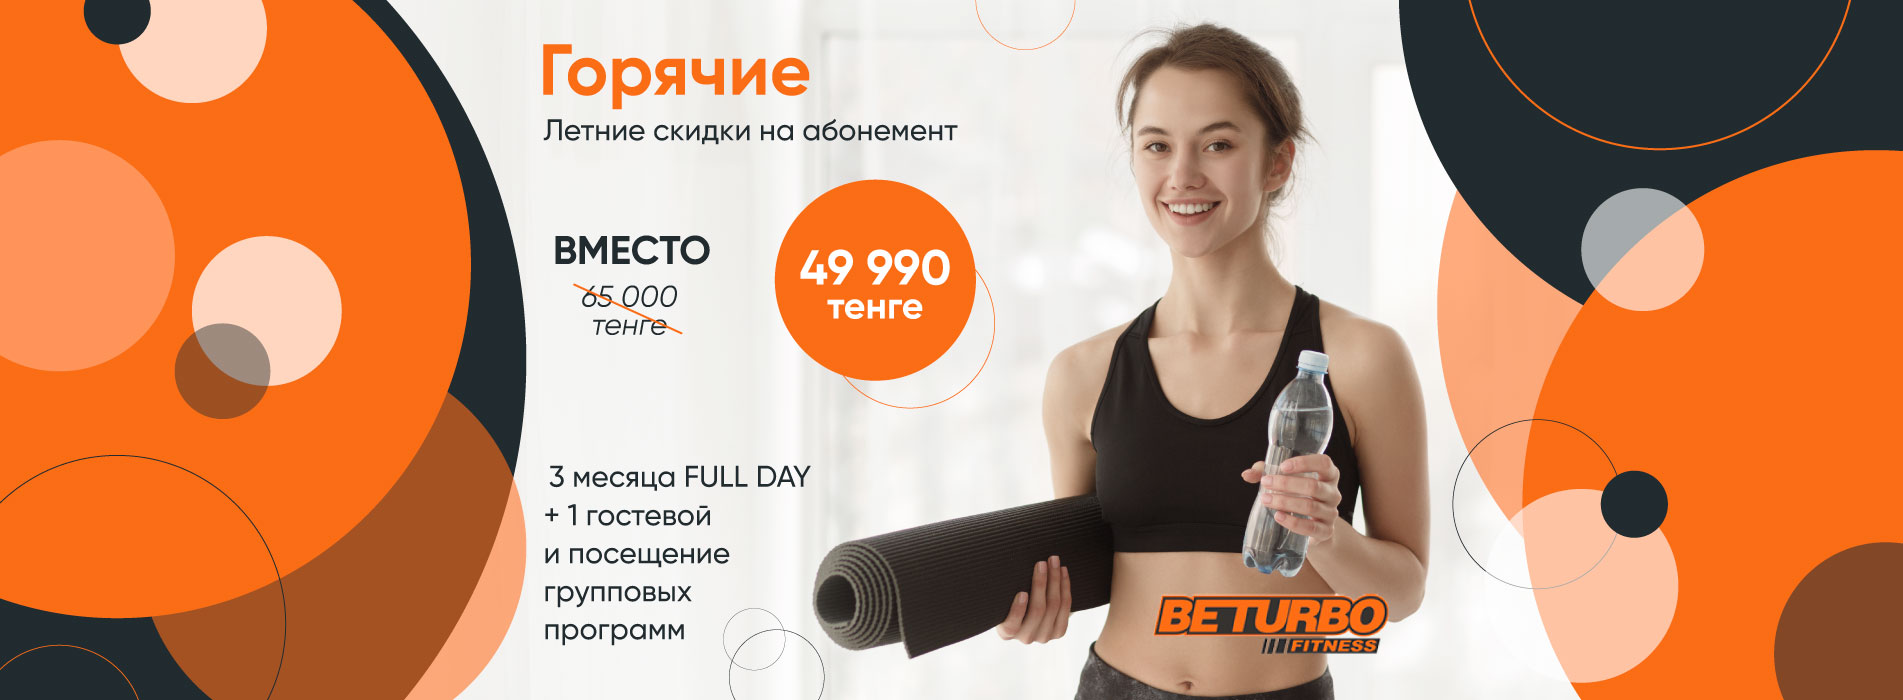 beturbo-1